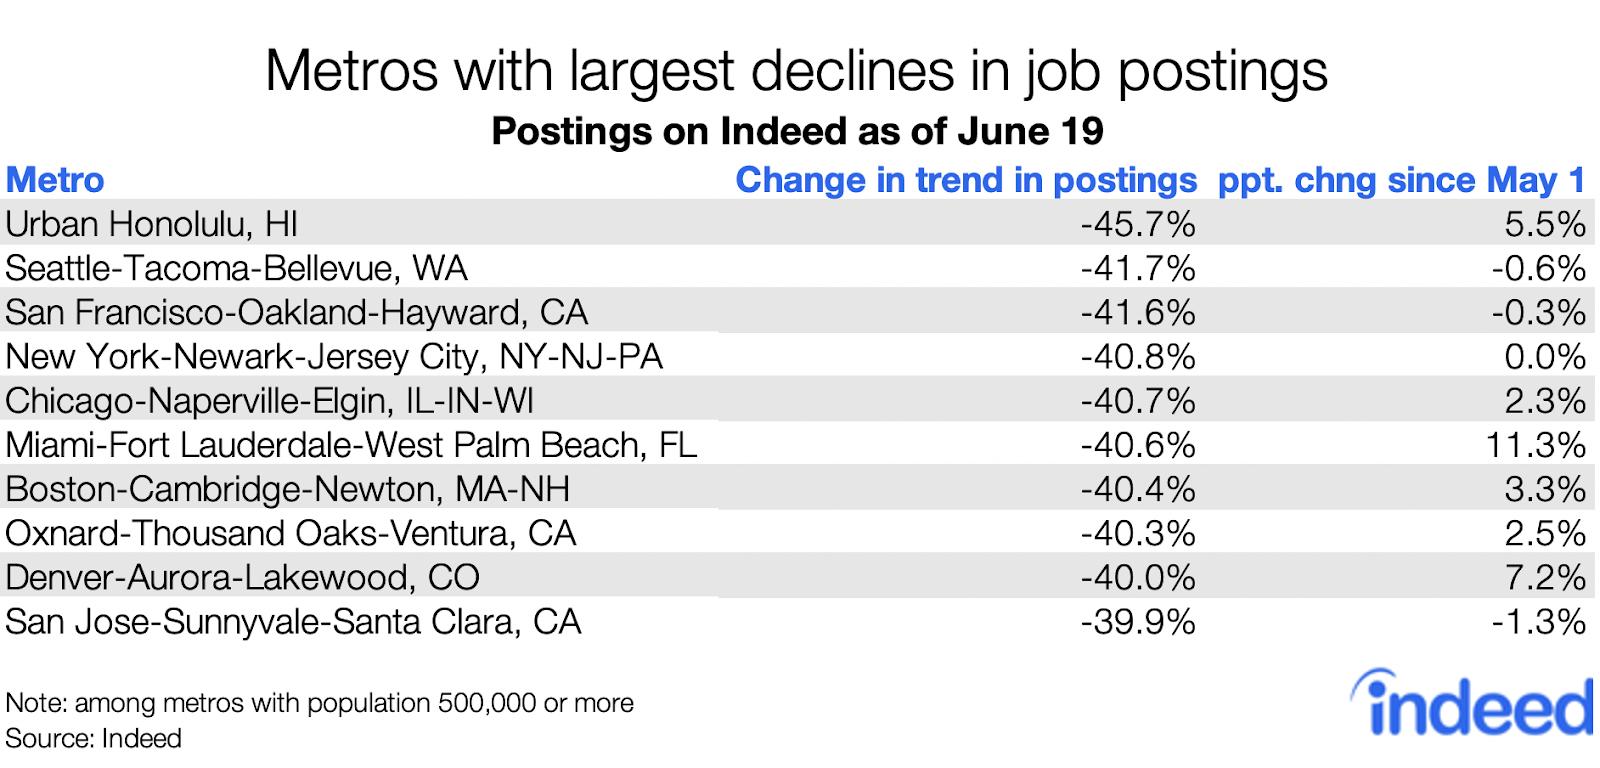 Metros with largest declines in job postings